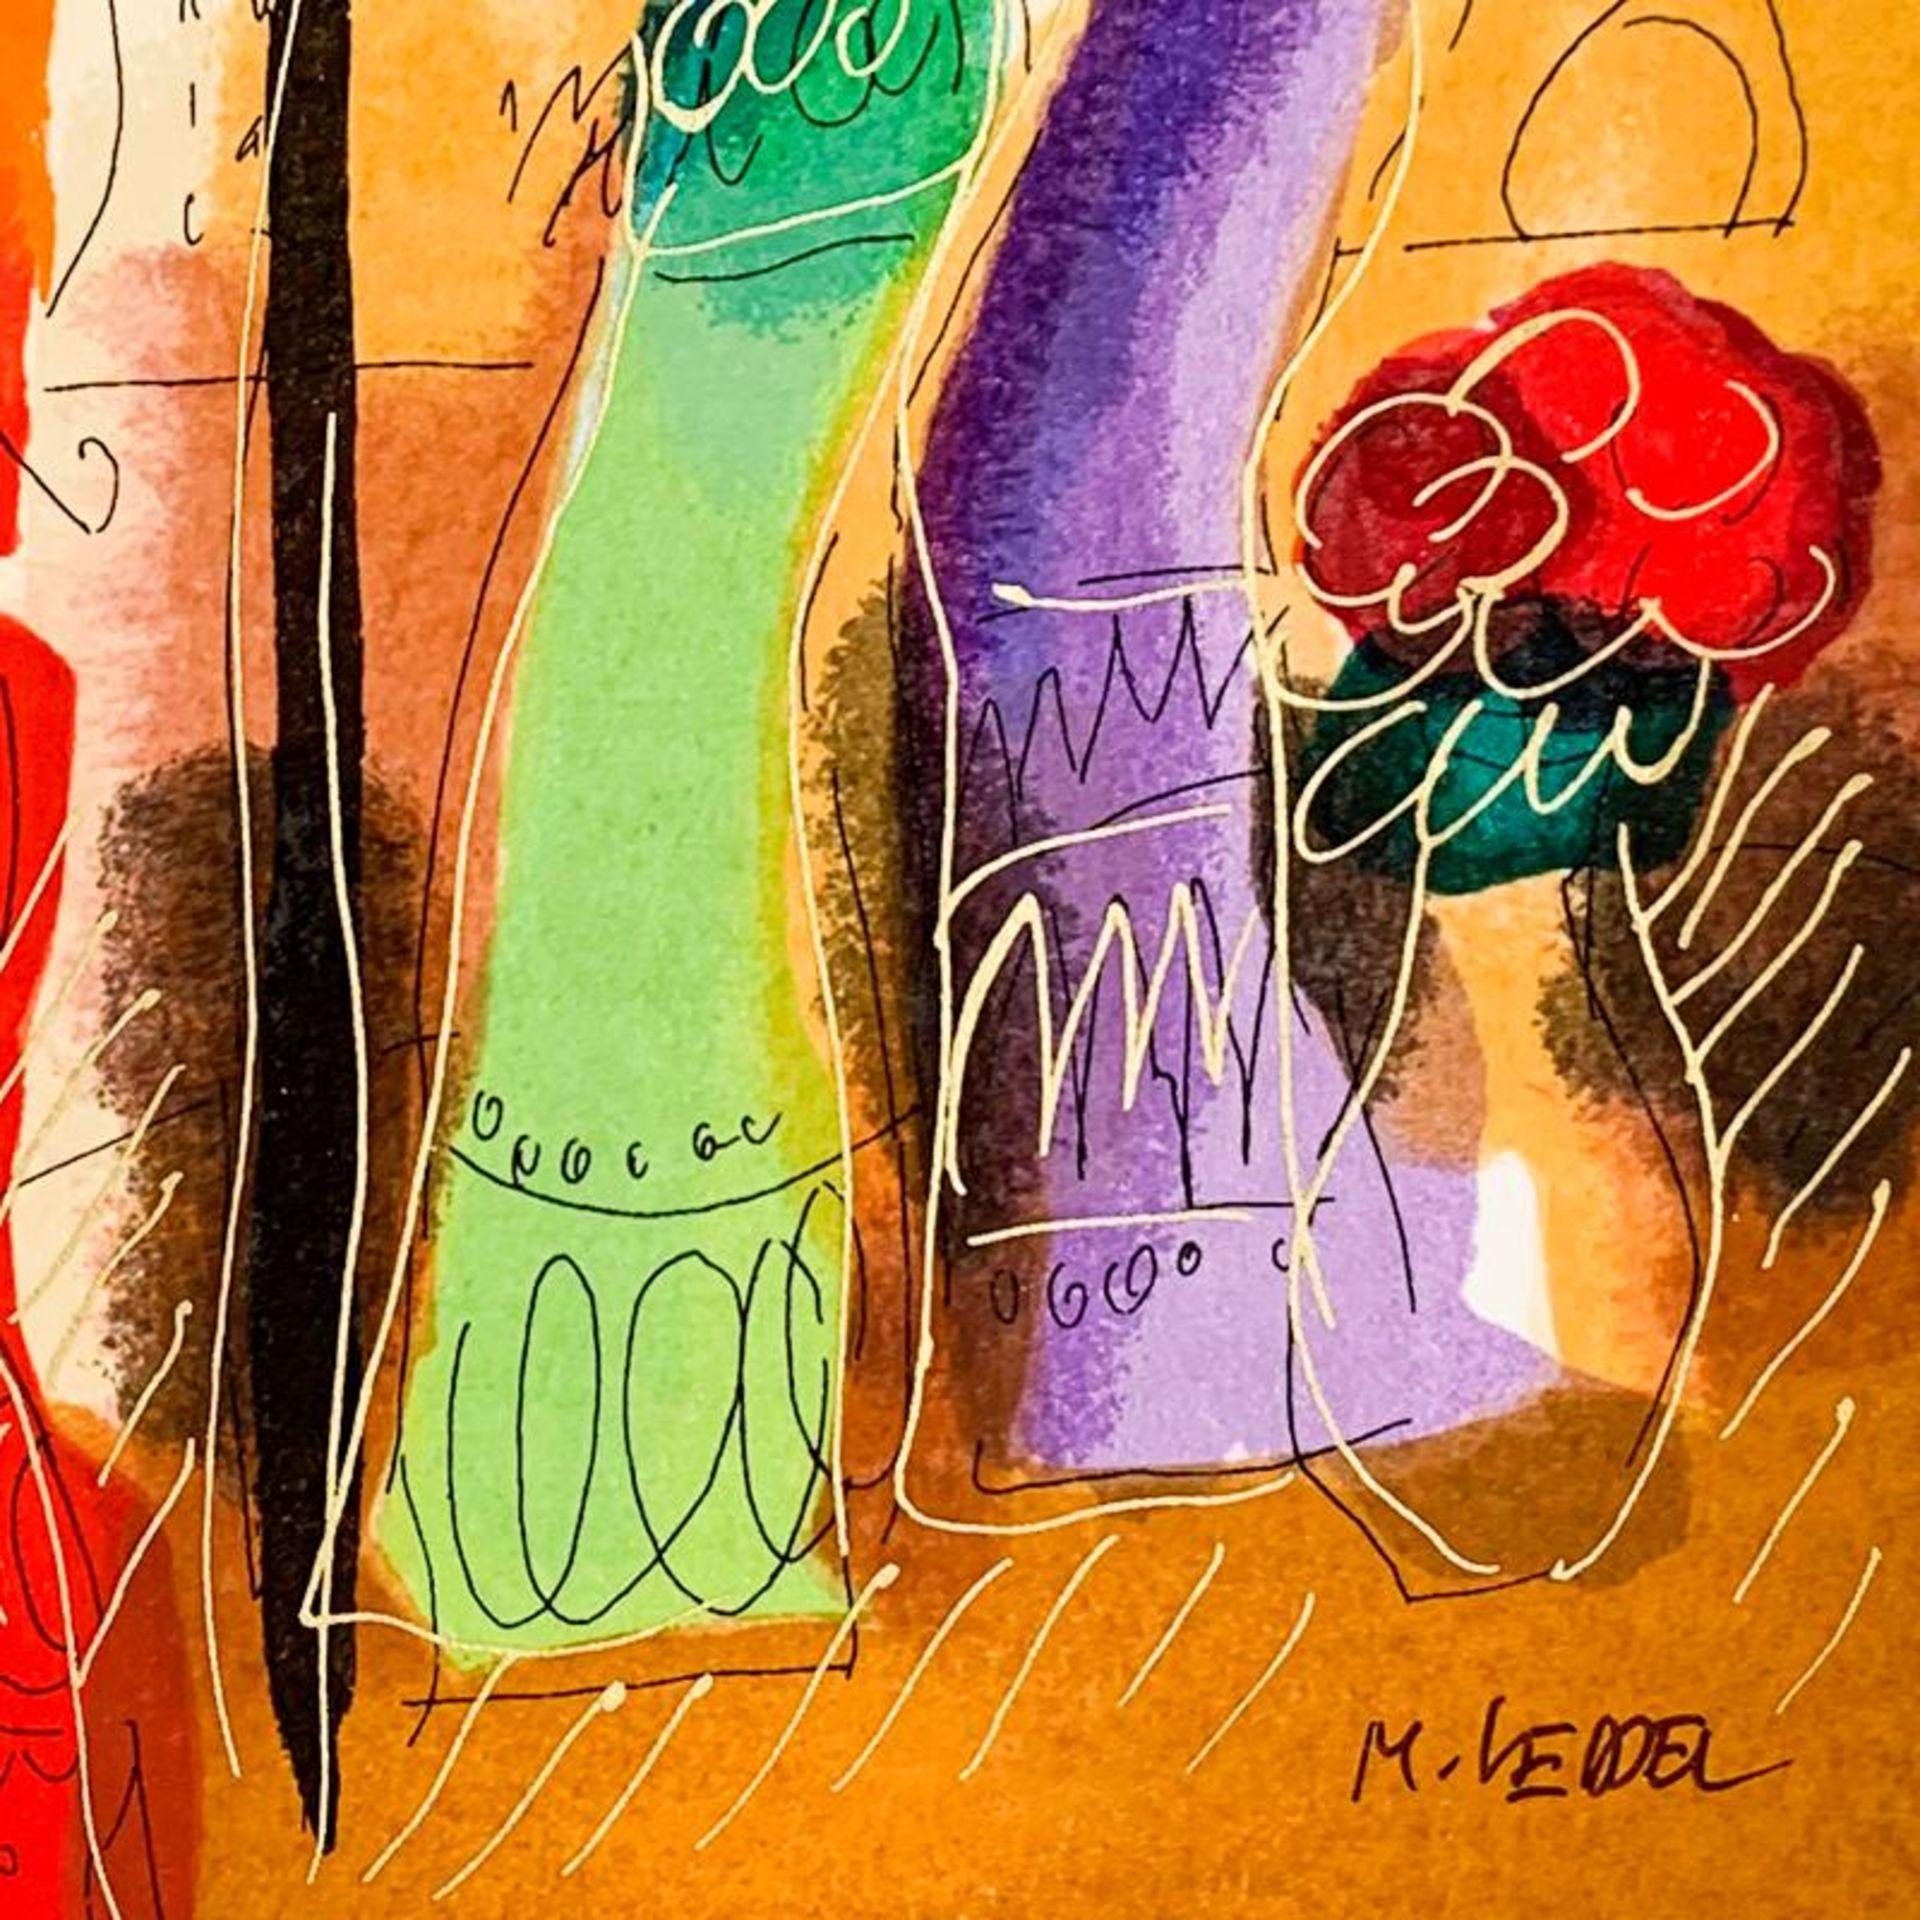 Untitled II by Leider, Moshe - Image 2 of 2